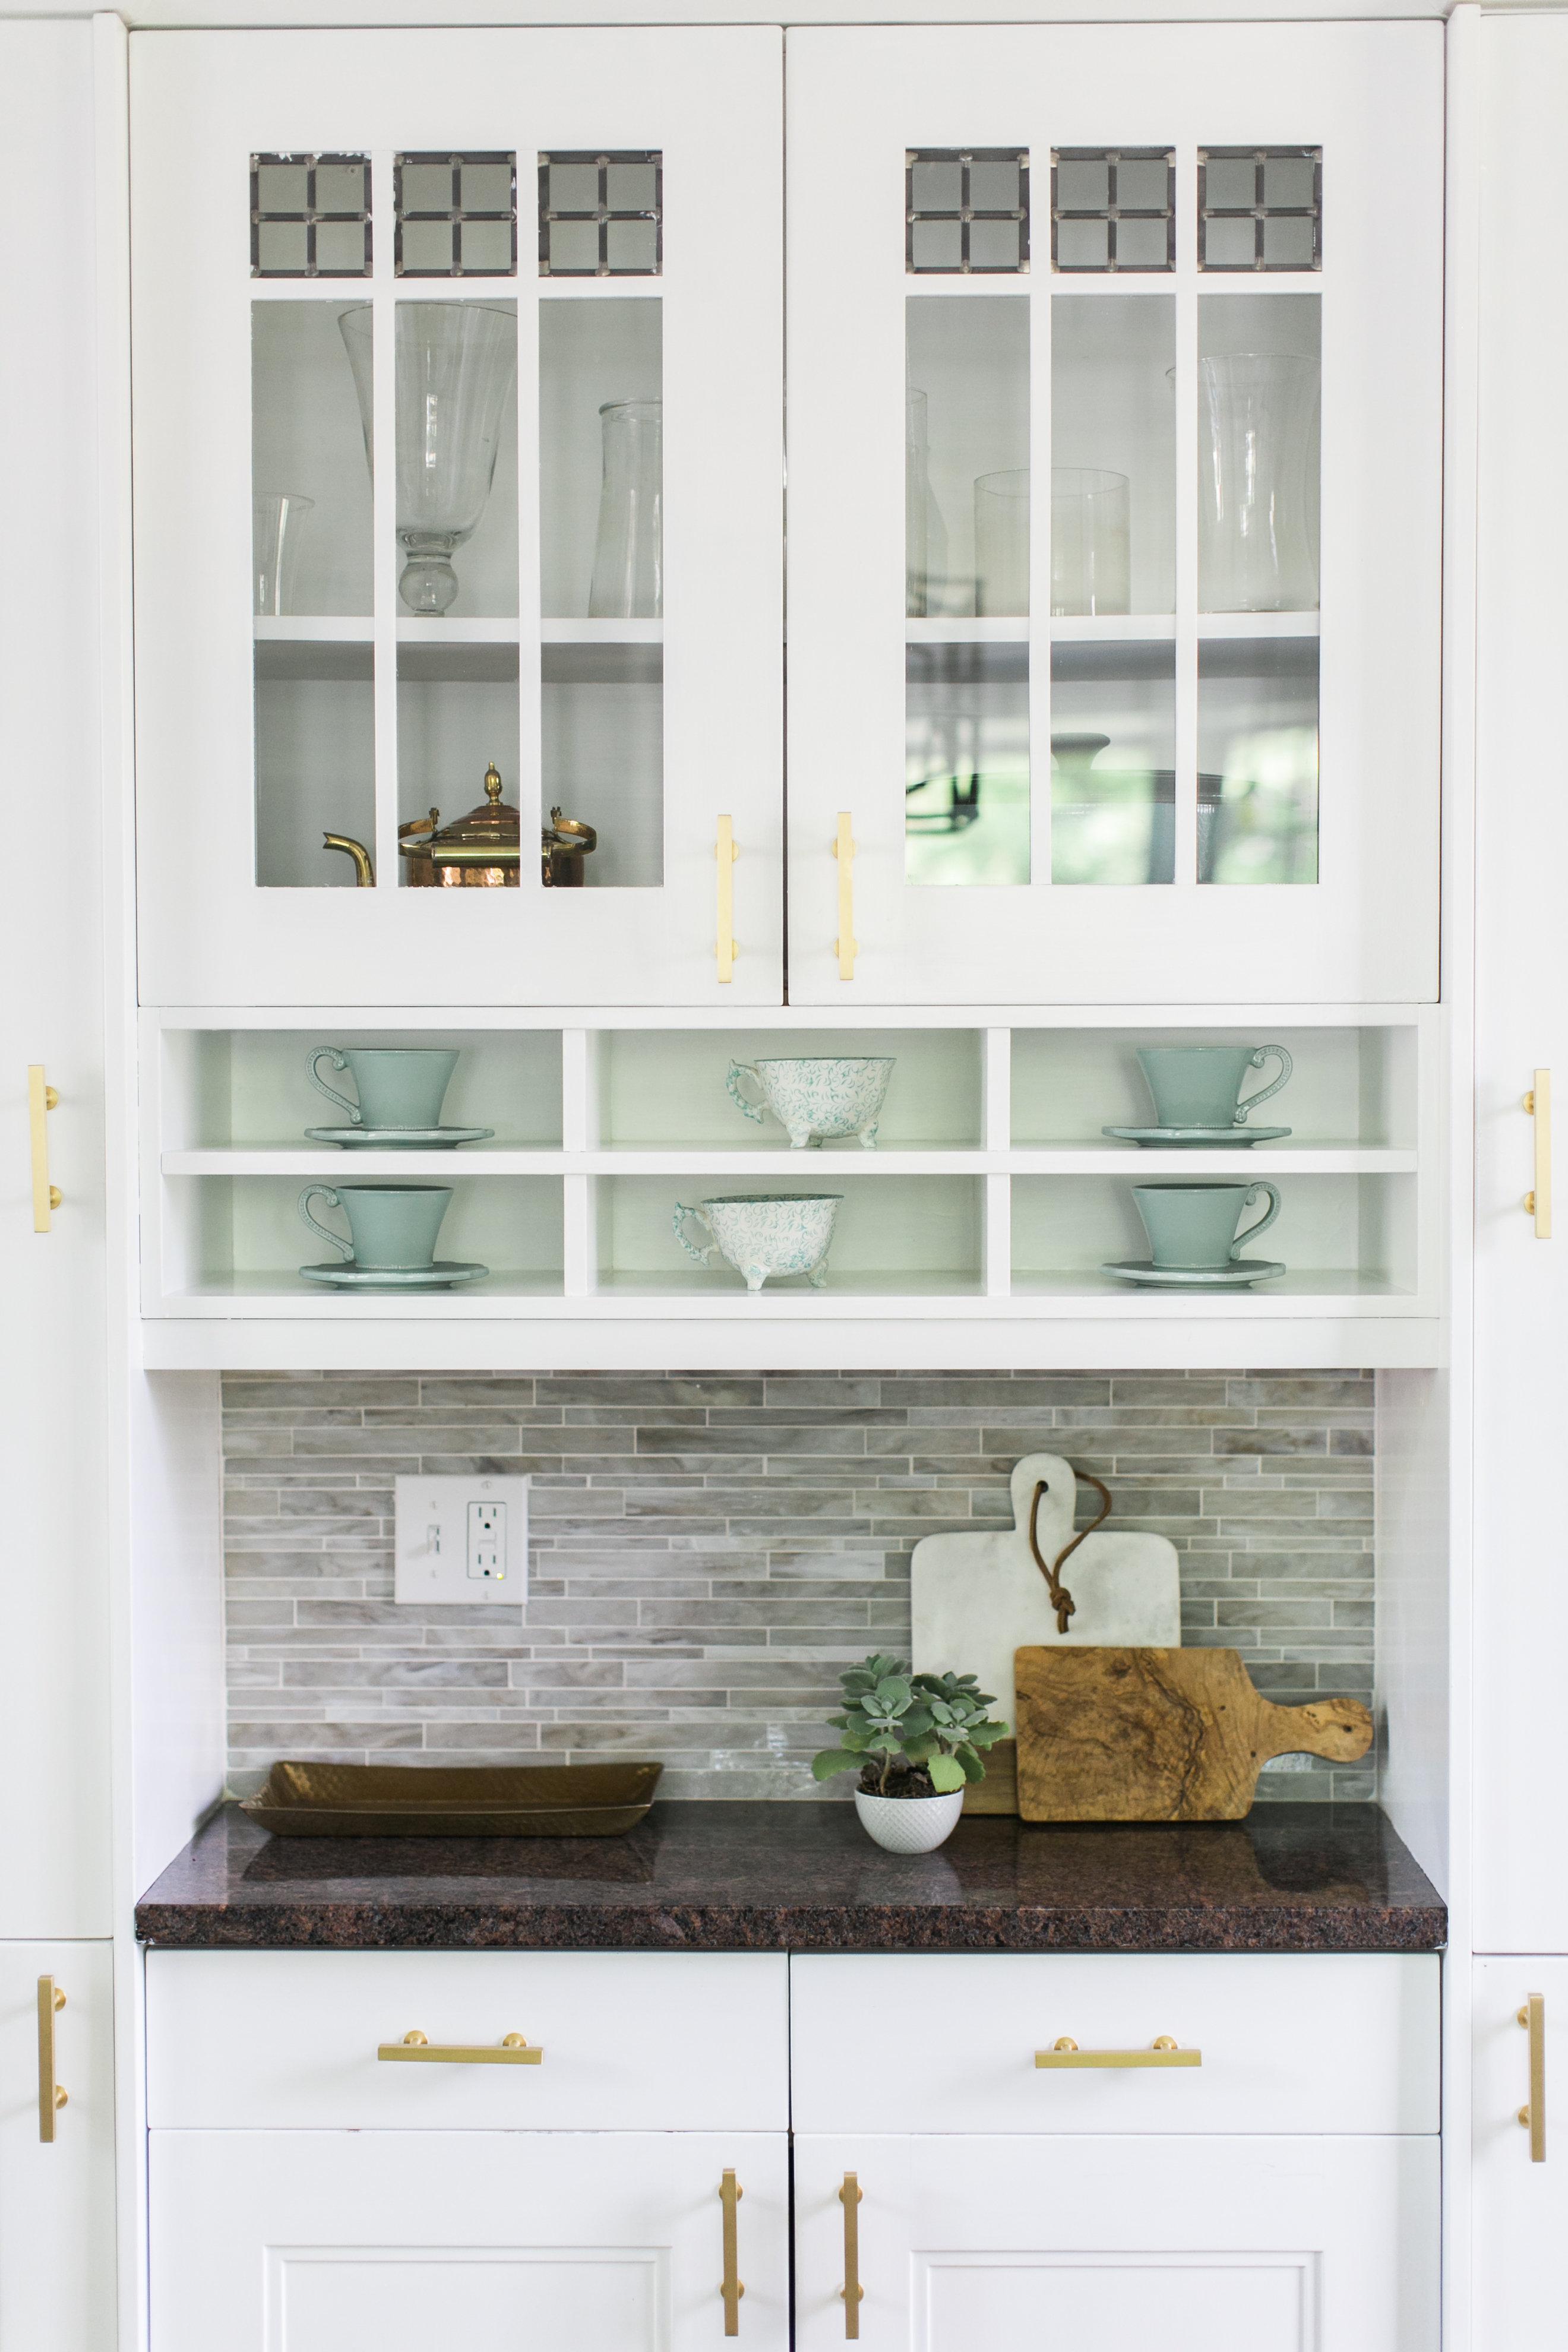 Kitchen – Finding Lovely